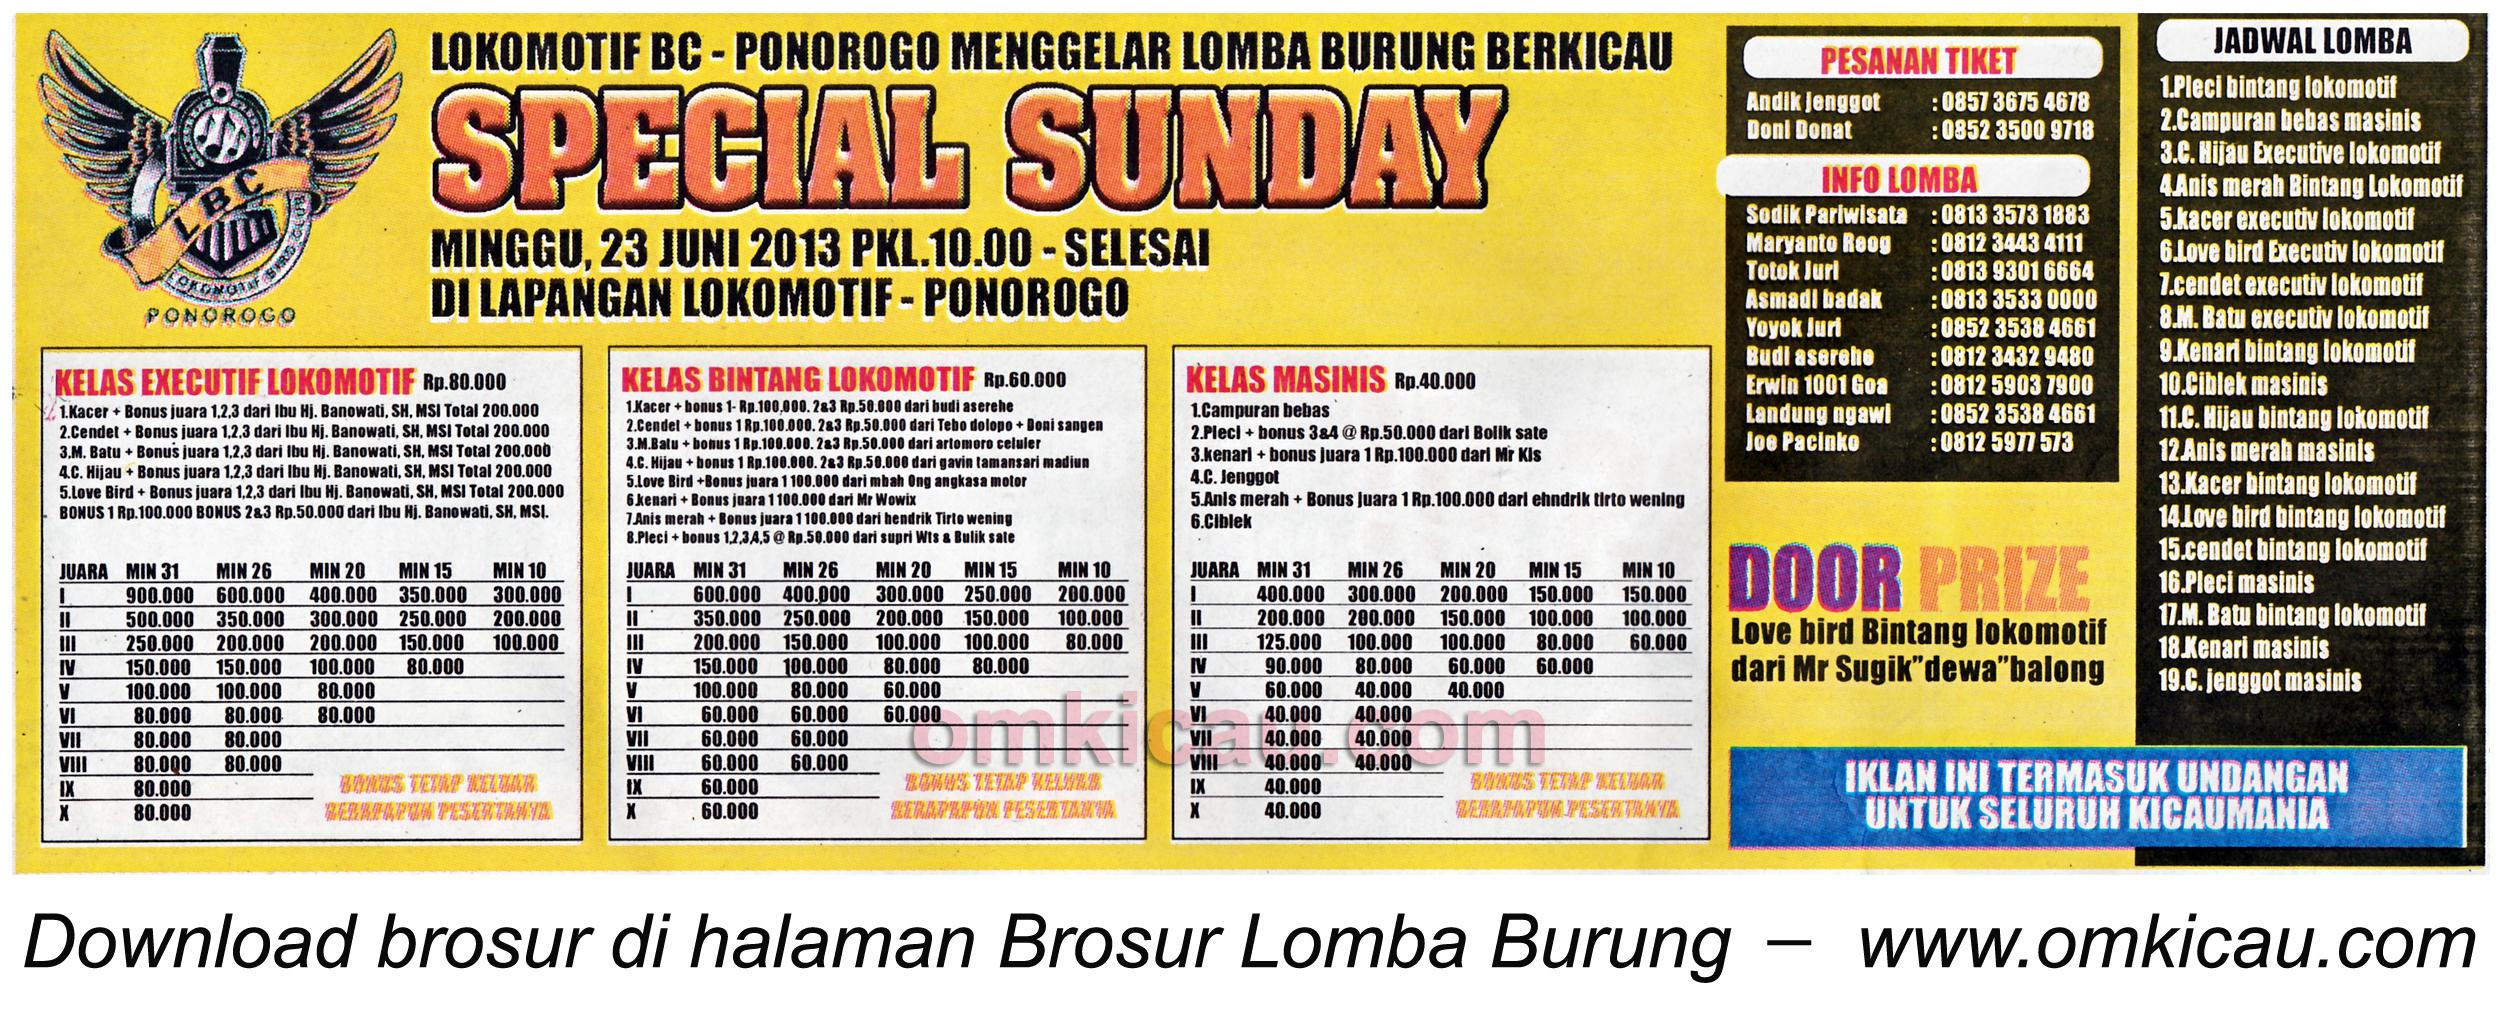 Brosur Lomba Special Sunday Lokomotif BC Ponorogo 23 Juni 2013